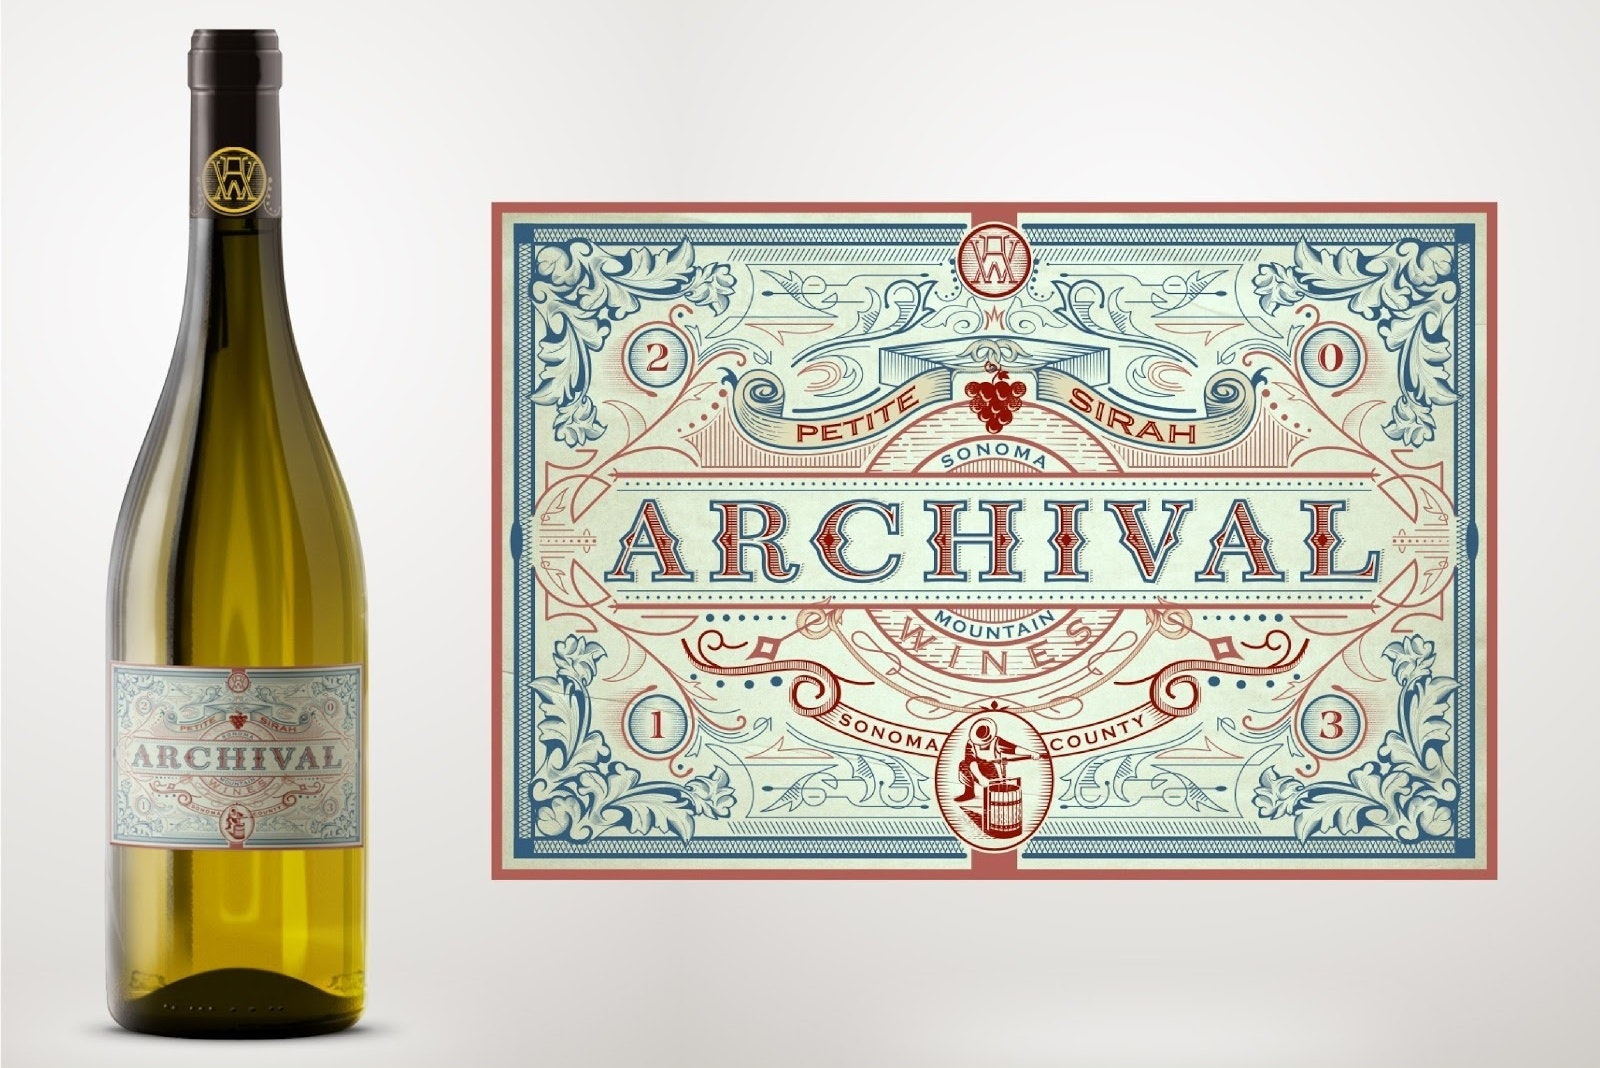 Archival wine